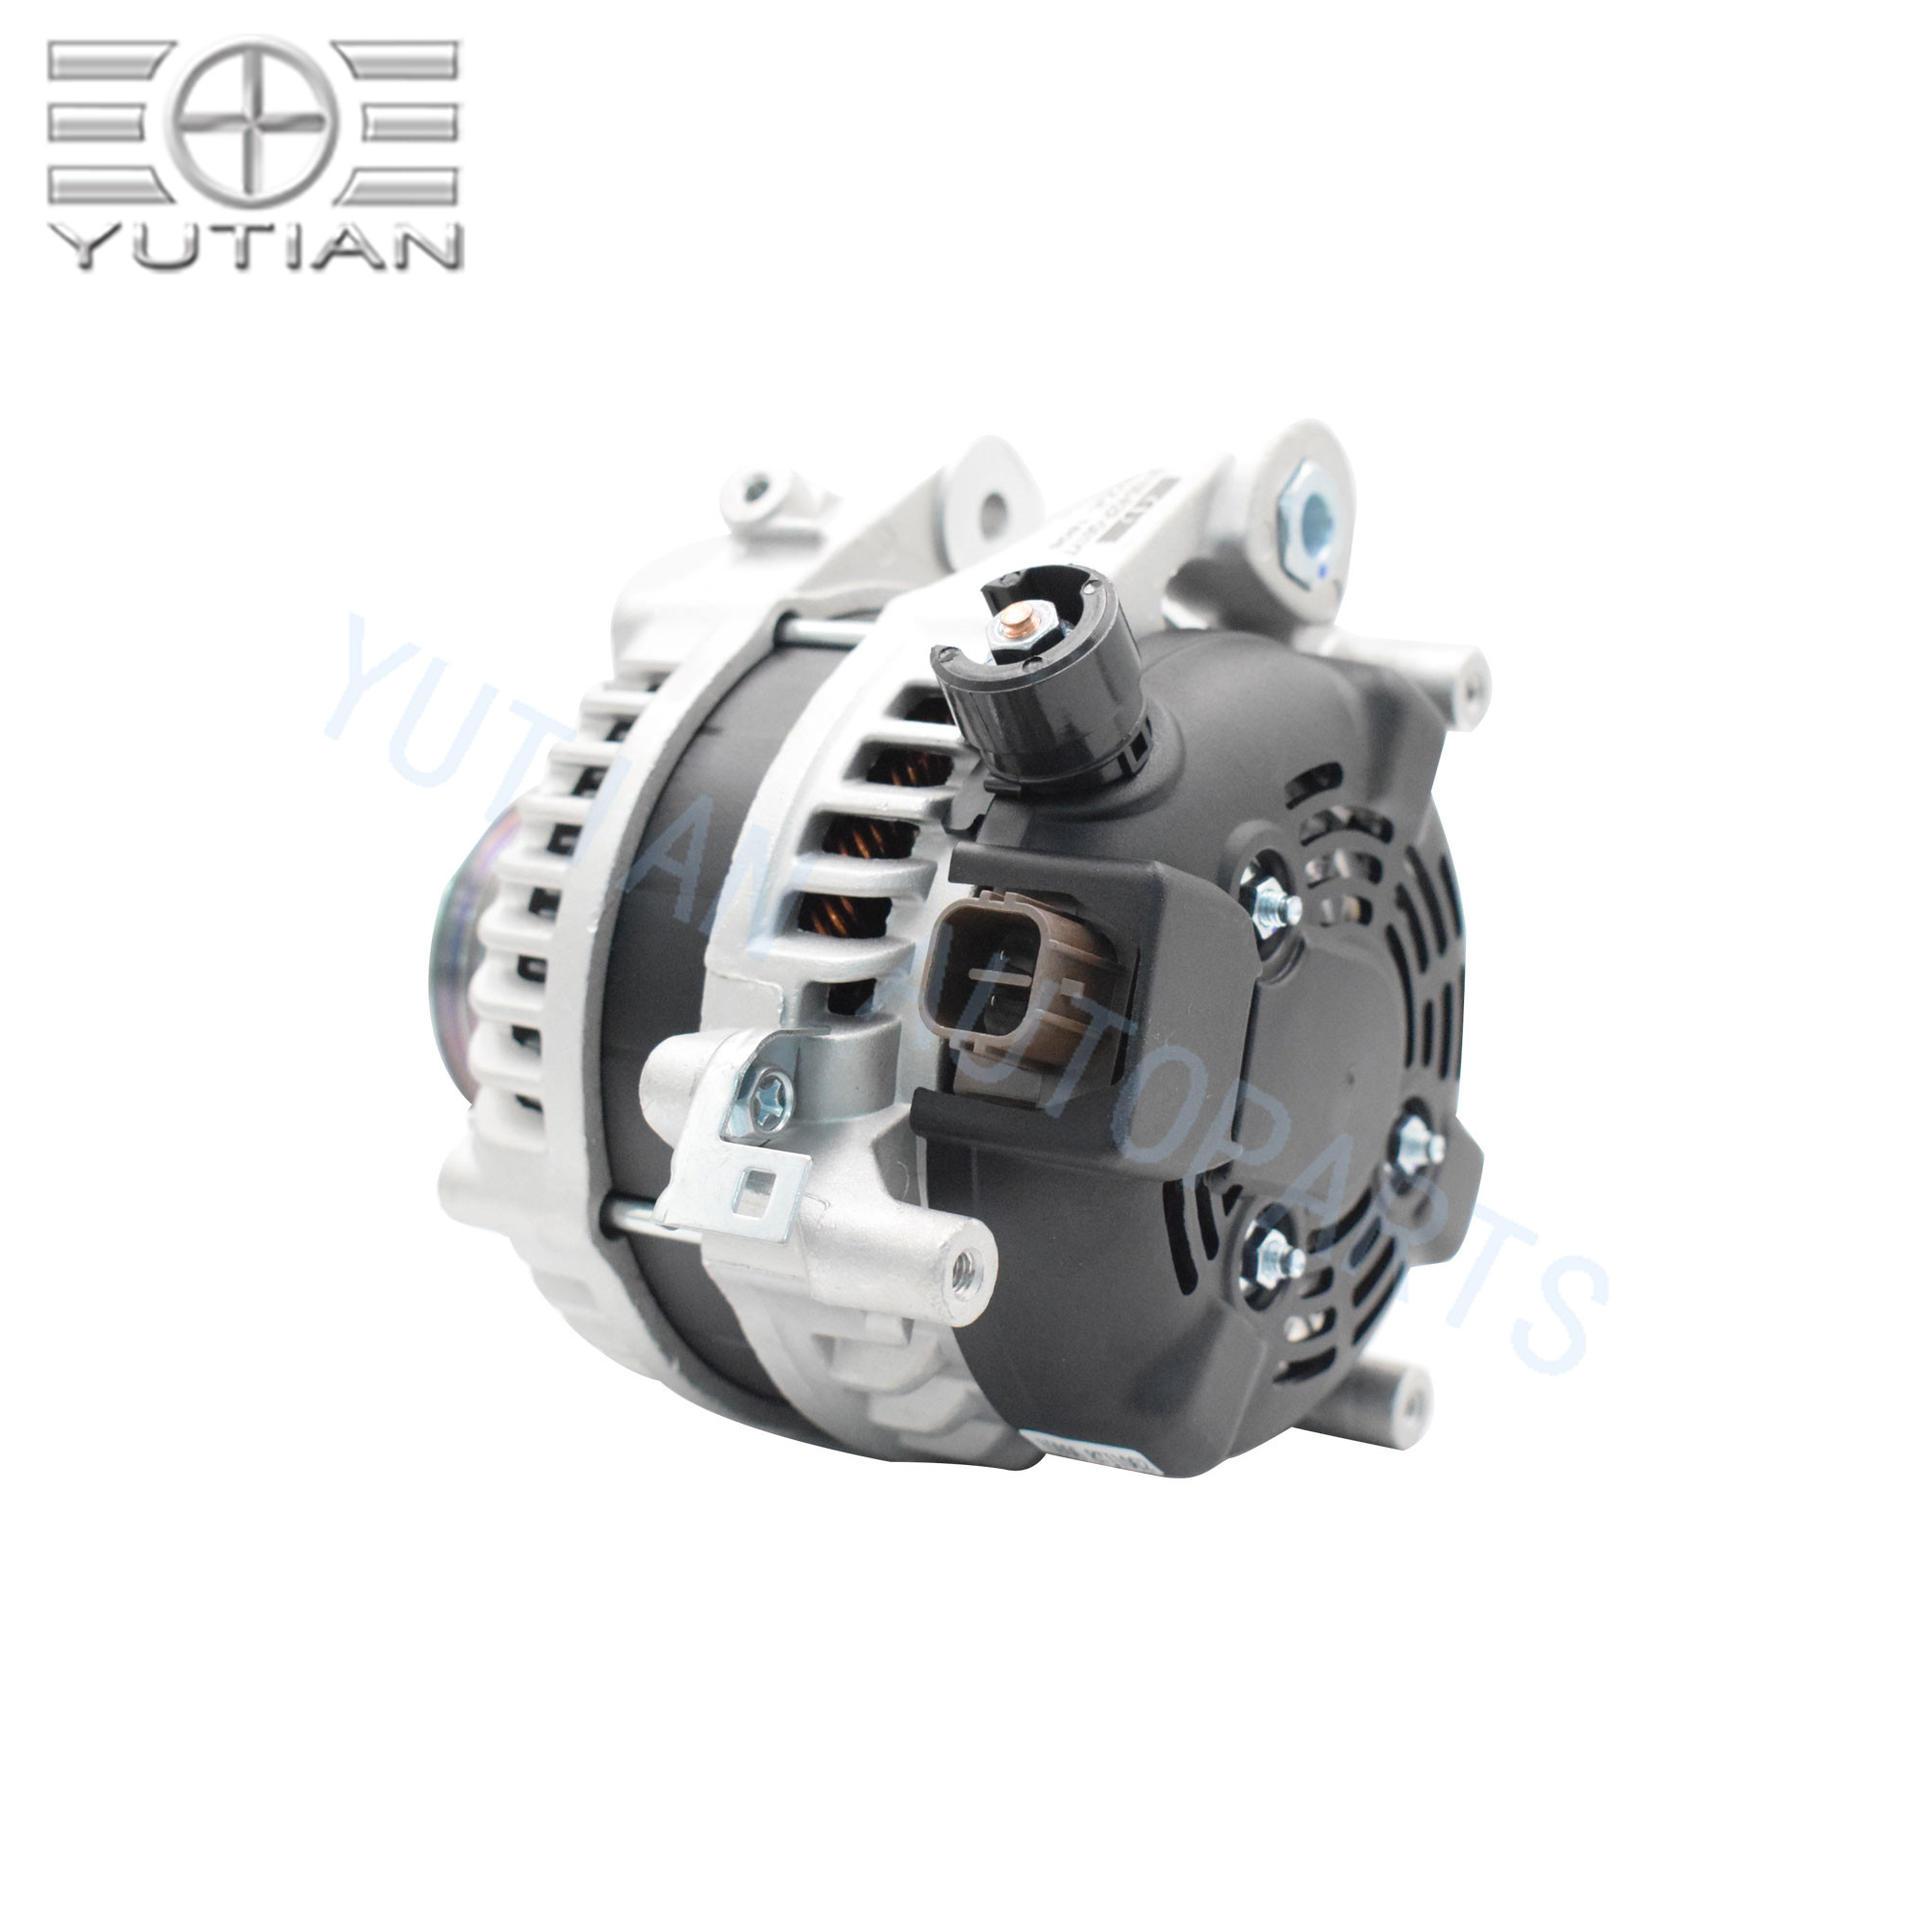 For Honda Alternator 2007-2011 CRV 2008-13 Accord Car Generator 14V/130A/7PK/CW/N OEM 31100-RZP-G01